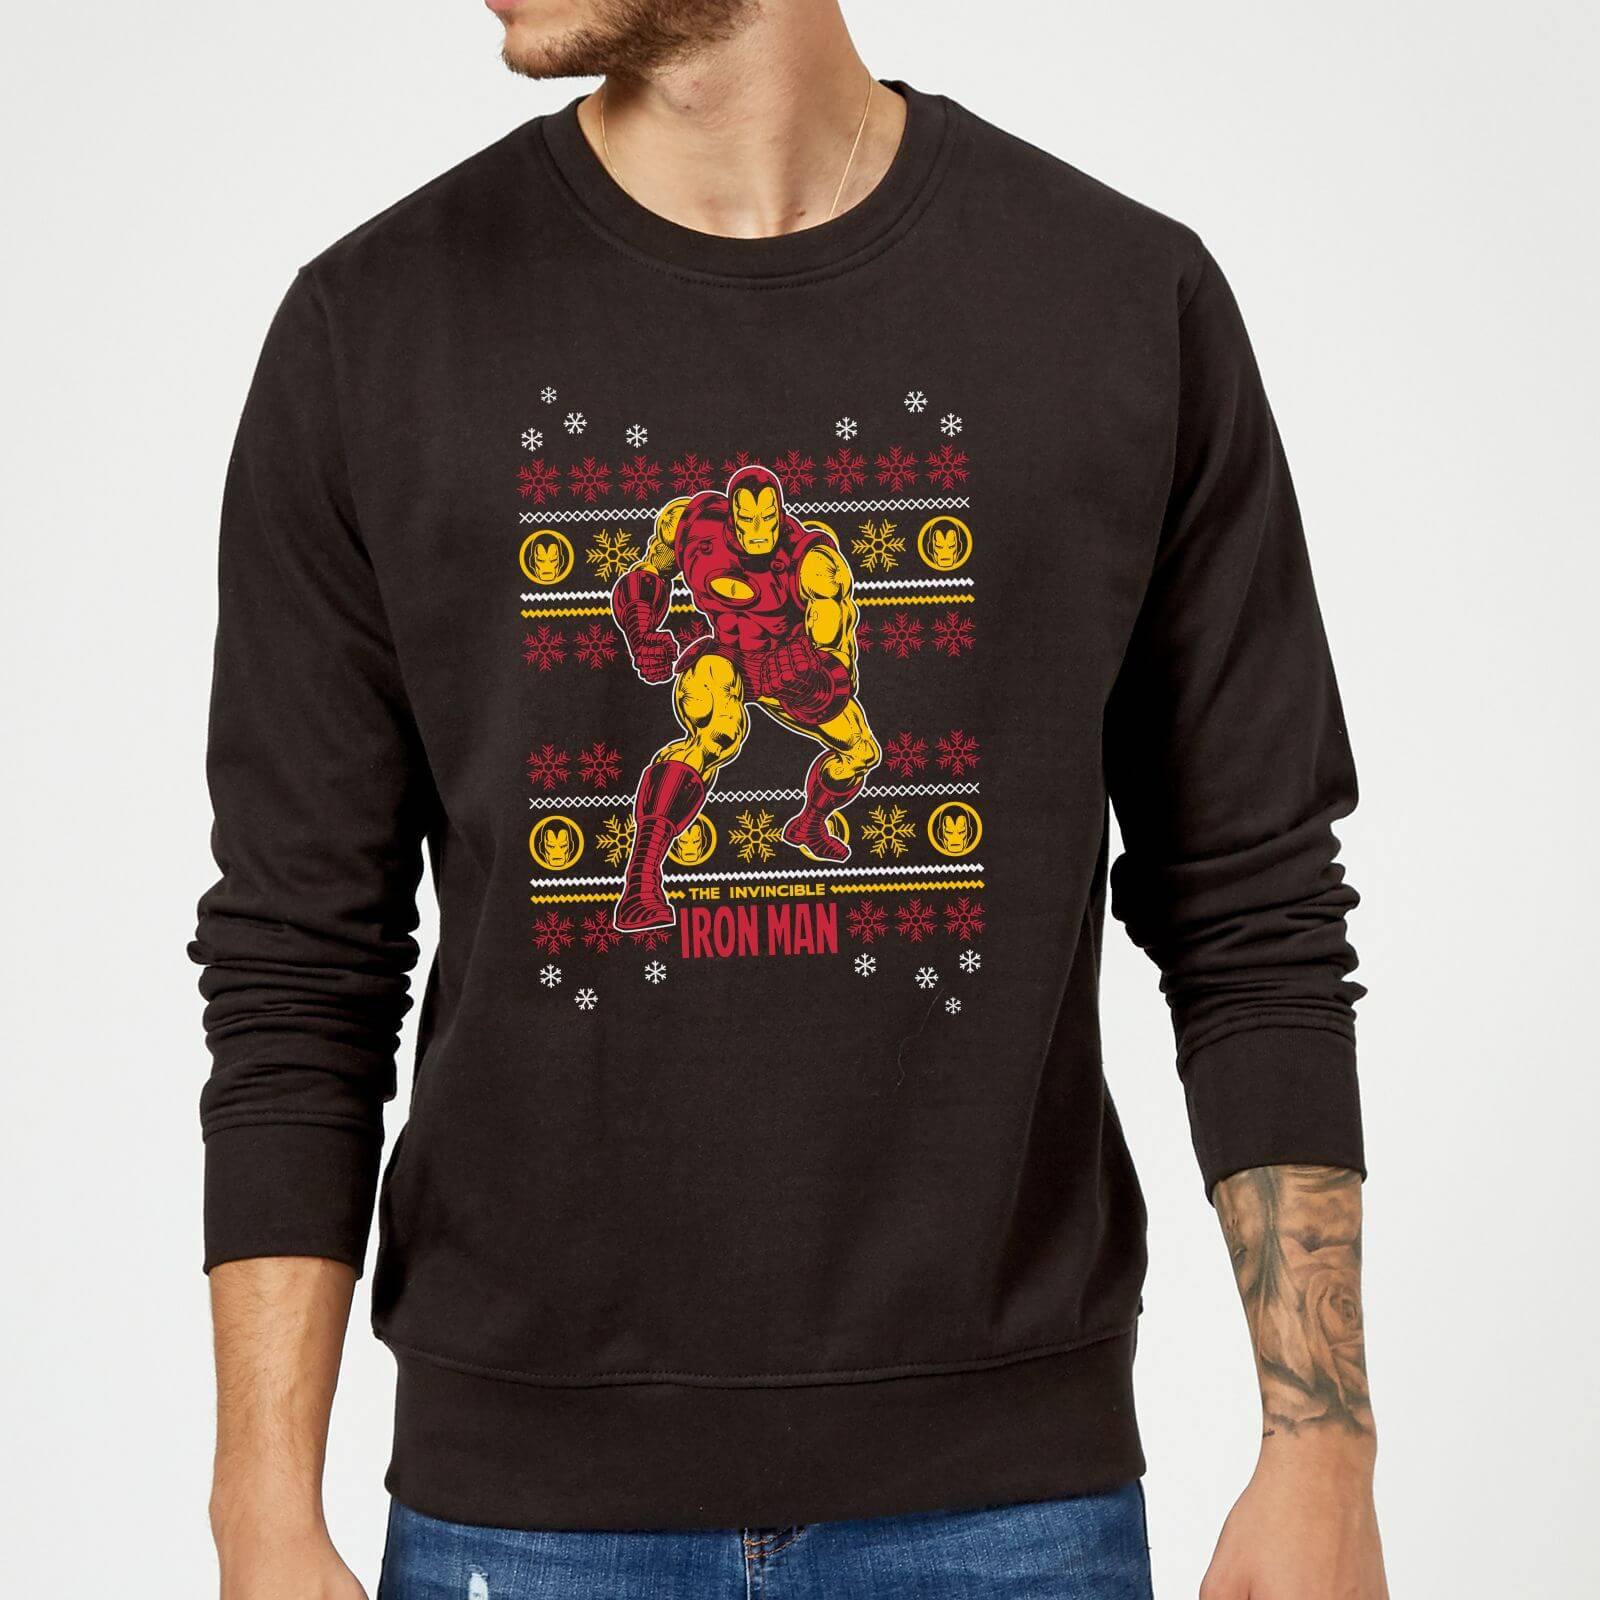 Kersttrui Man.Marvel Comics The Invincible Iron Man Kersttrui Zwart Zavvi Nl